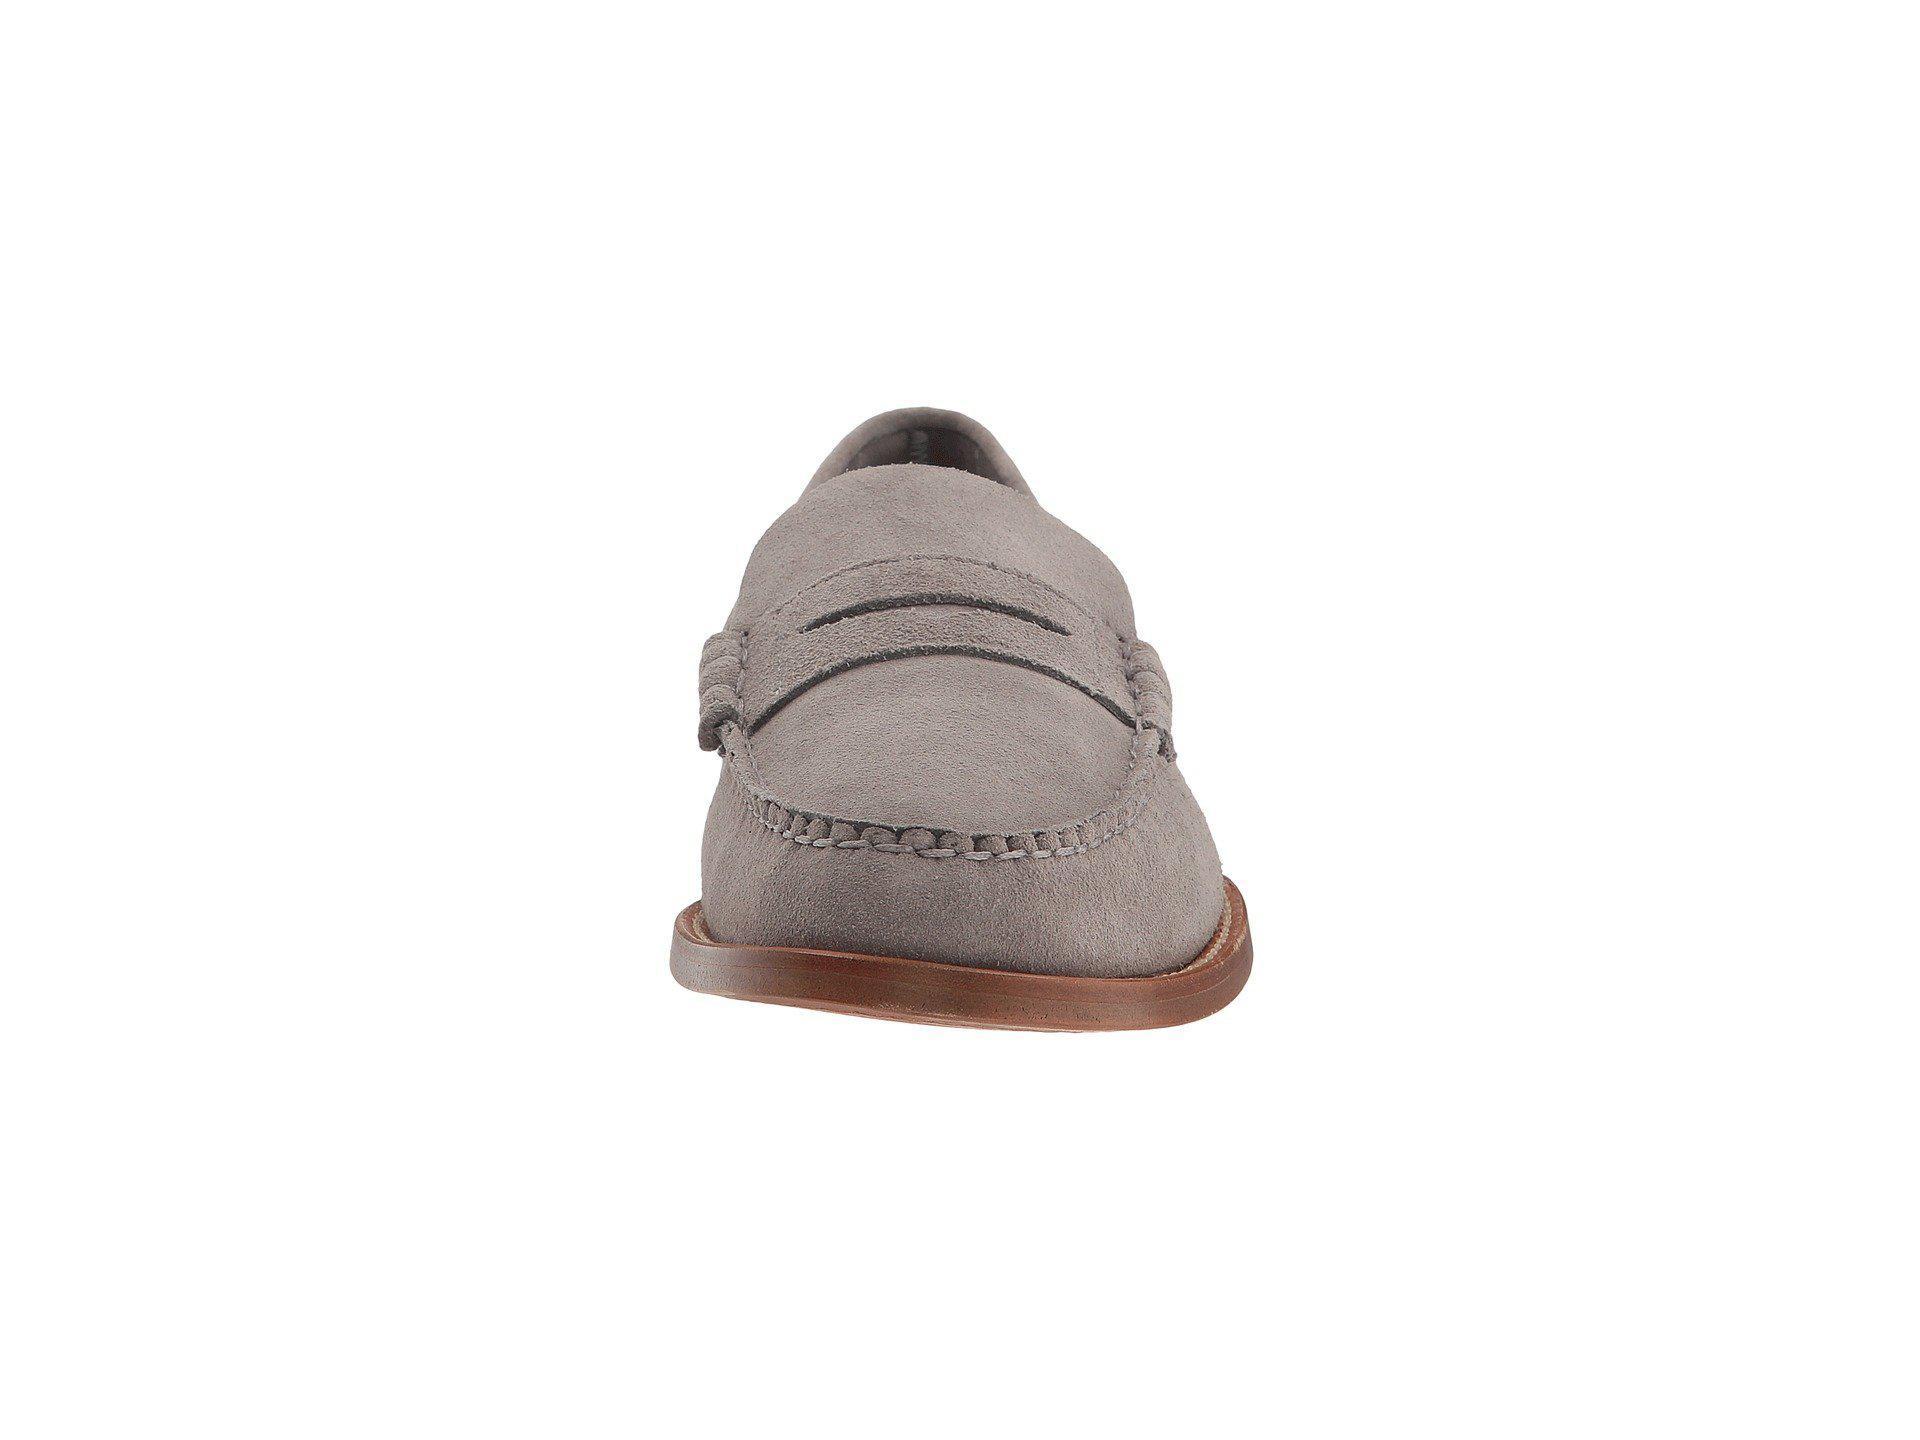 394b12d585e Sebago - Gray Legacy Penny (grey Suede) Men s Slip On Shoes for Men -. View  fullscreen